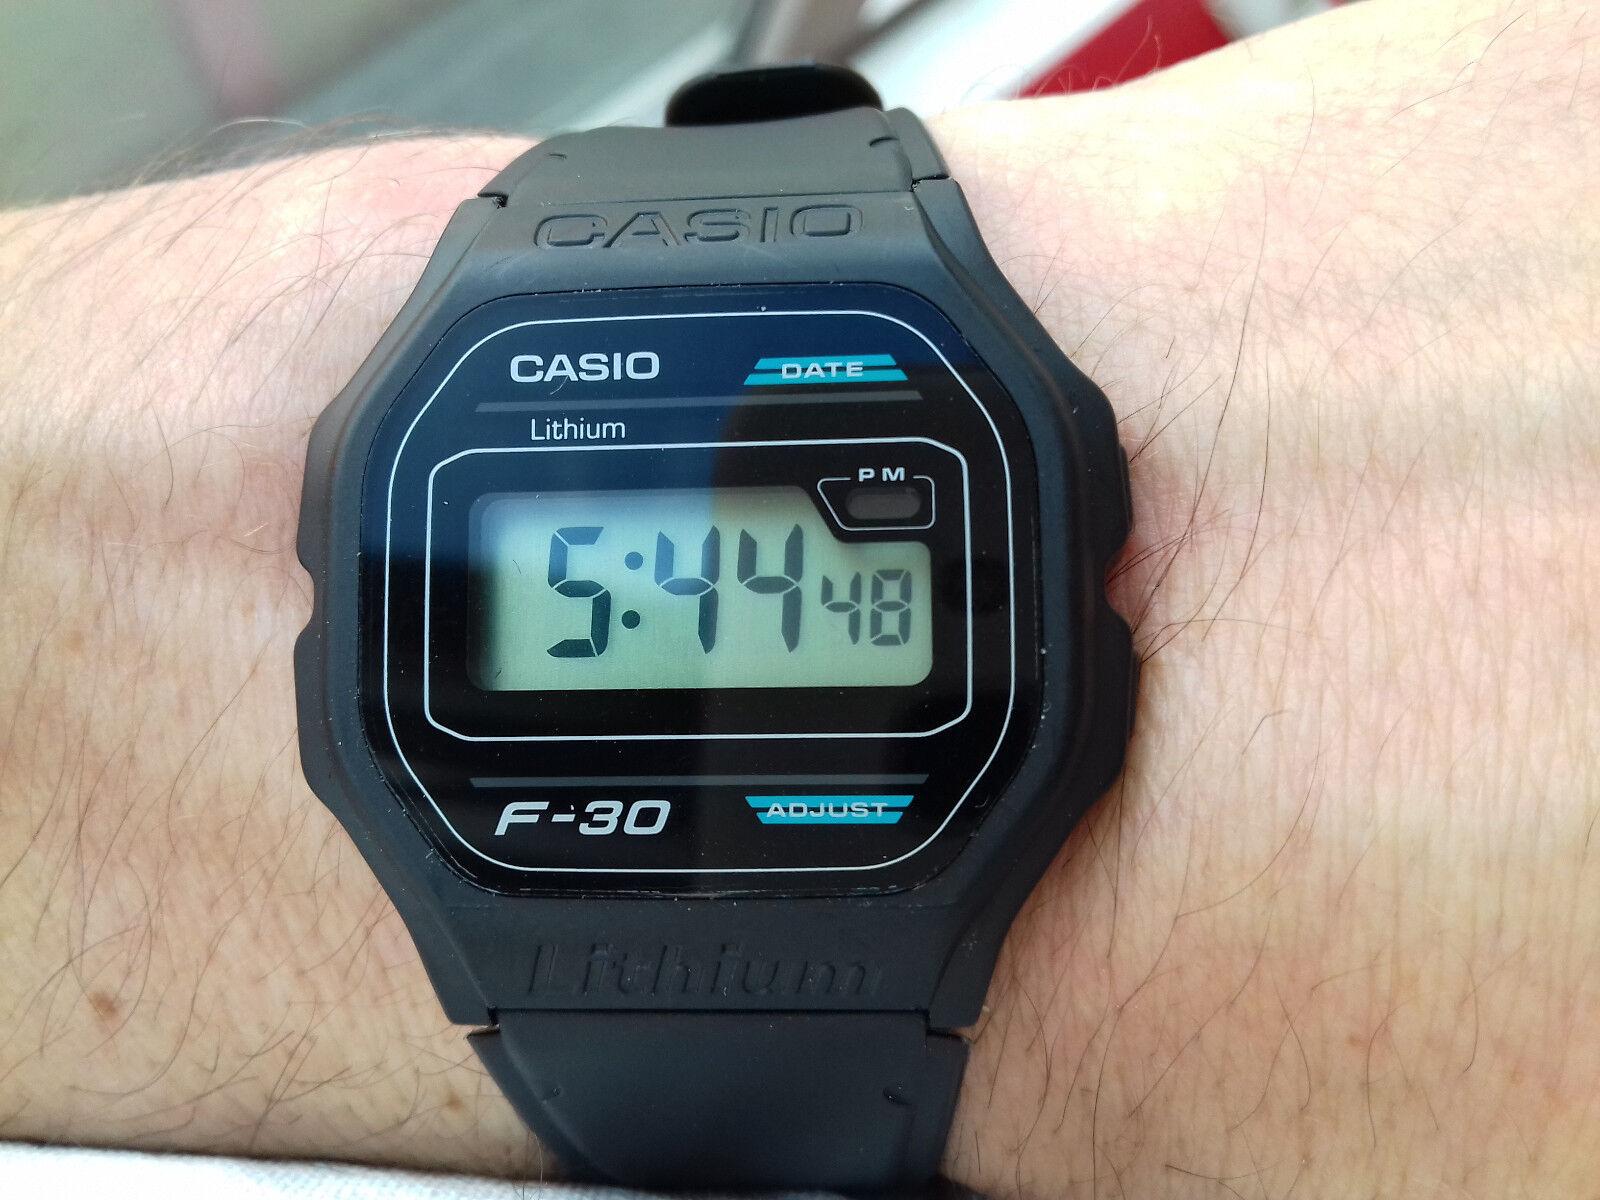 dd1dc50e73aa Casio VINTAGE COLLECTION F-30 MODULE 1007 NOS WATCH MONTRE ...